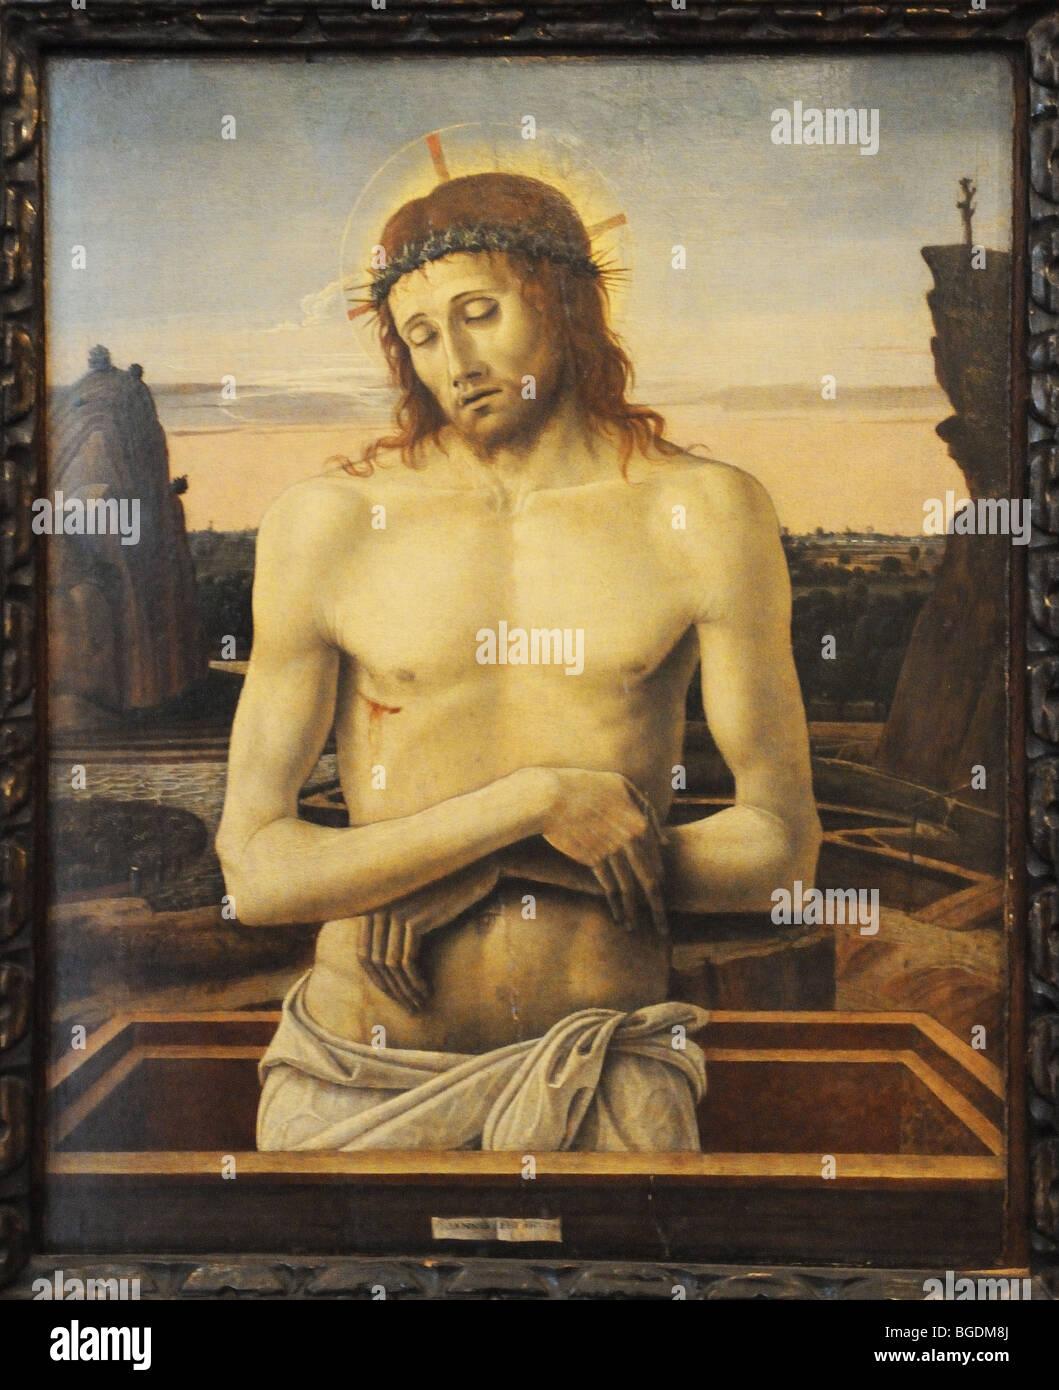 Renaissance-Gemälde von Giovanni Bellini genannt IMAGO Glaubens in das Poldi Pezzoli Museum Mailand Italien Stockbild